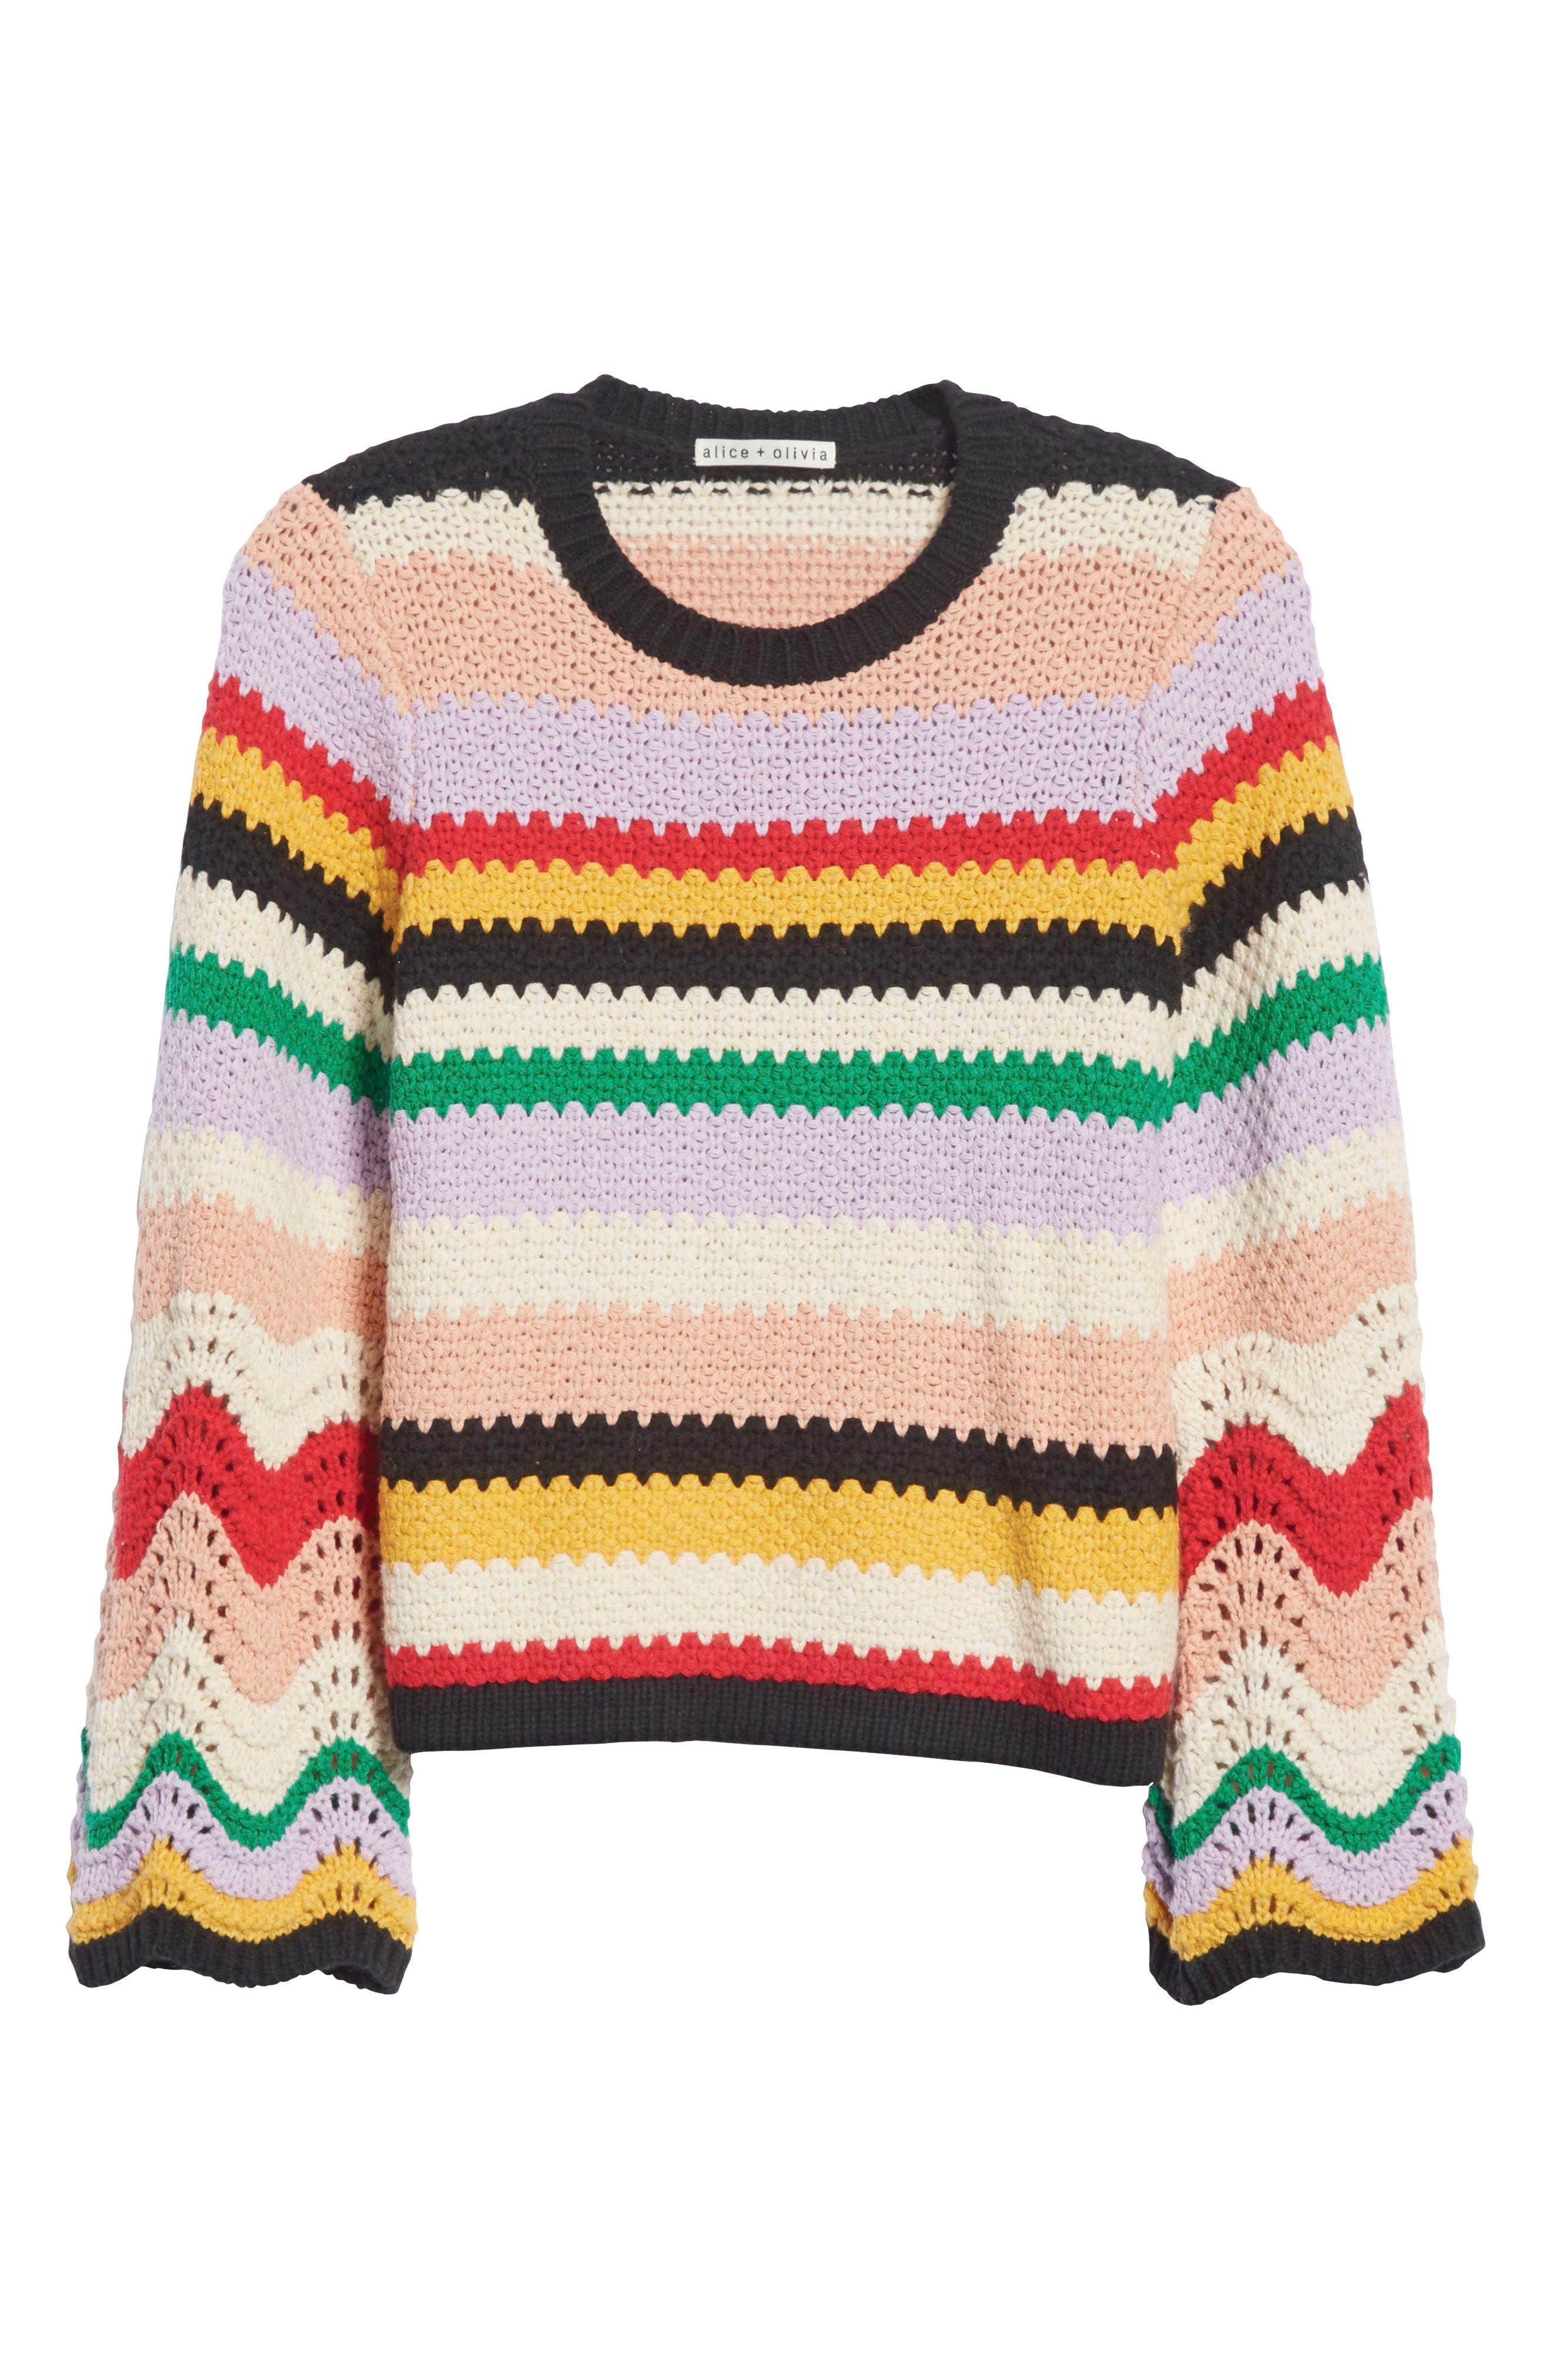 ALICE + OLIVIA, Alivia Stripe Bell Sleeve Cotton Blend Sweater, Alternate thumbnail 7, color, MULTI